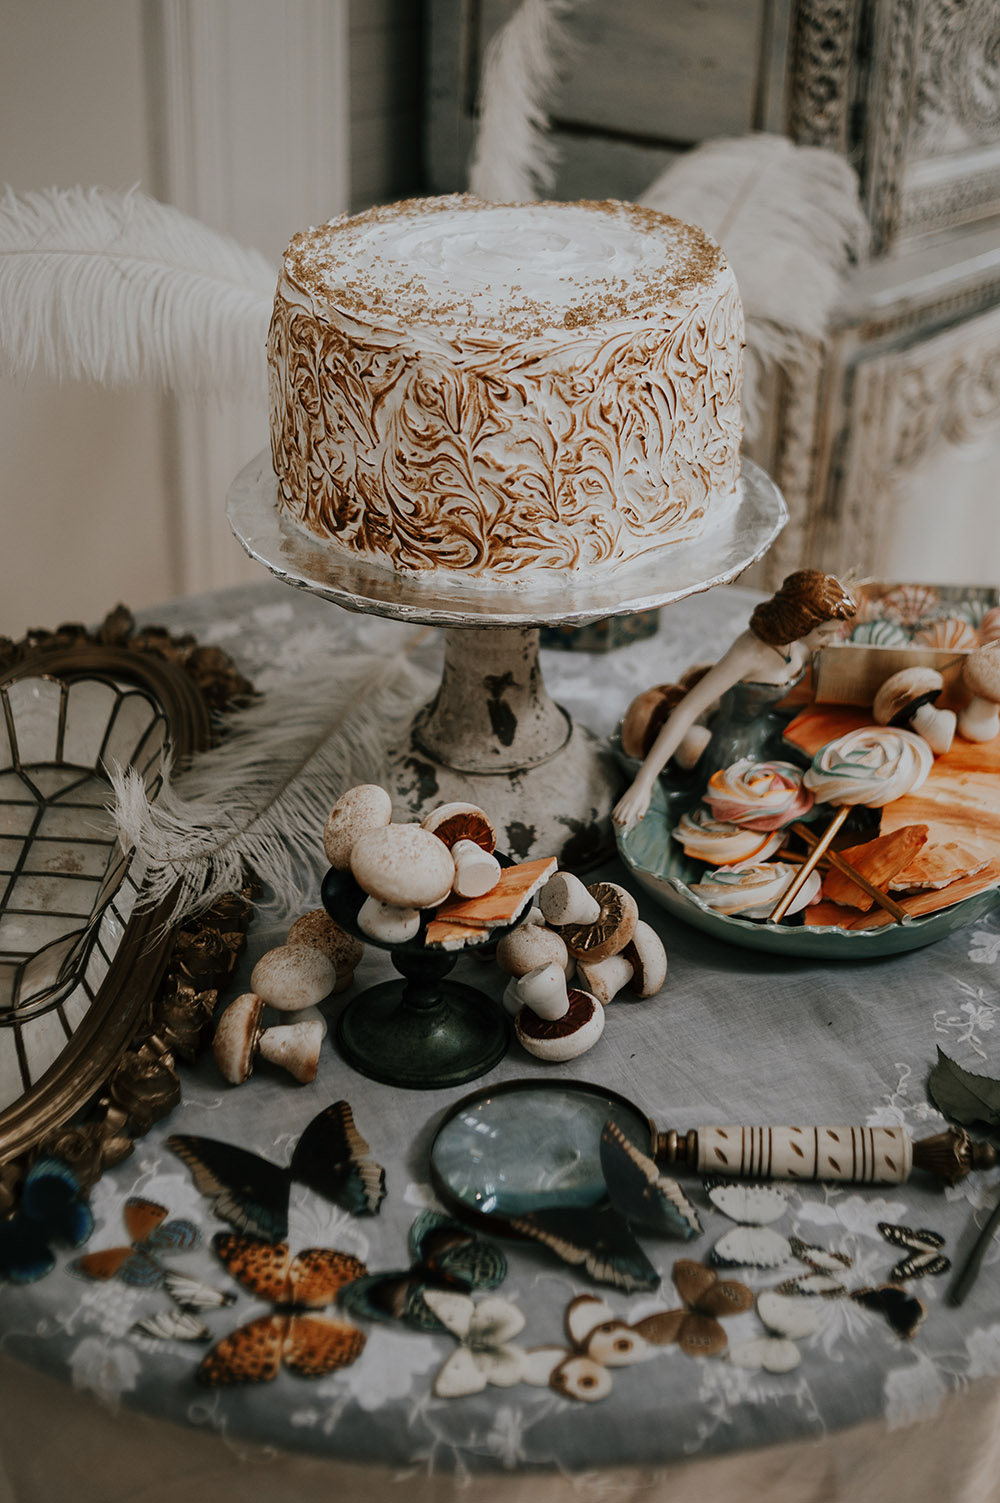 A toasted meringue cake